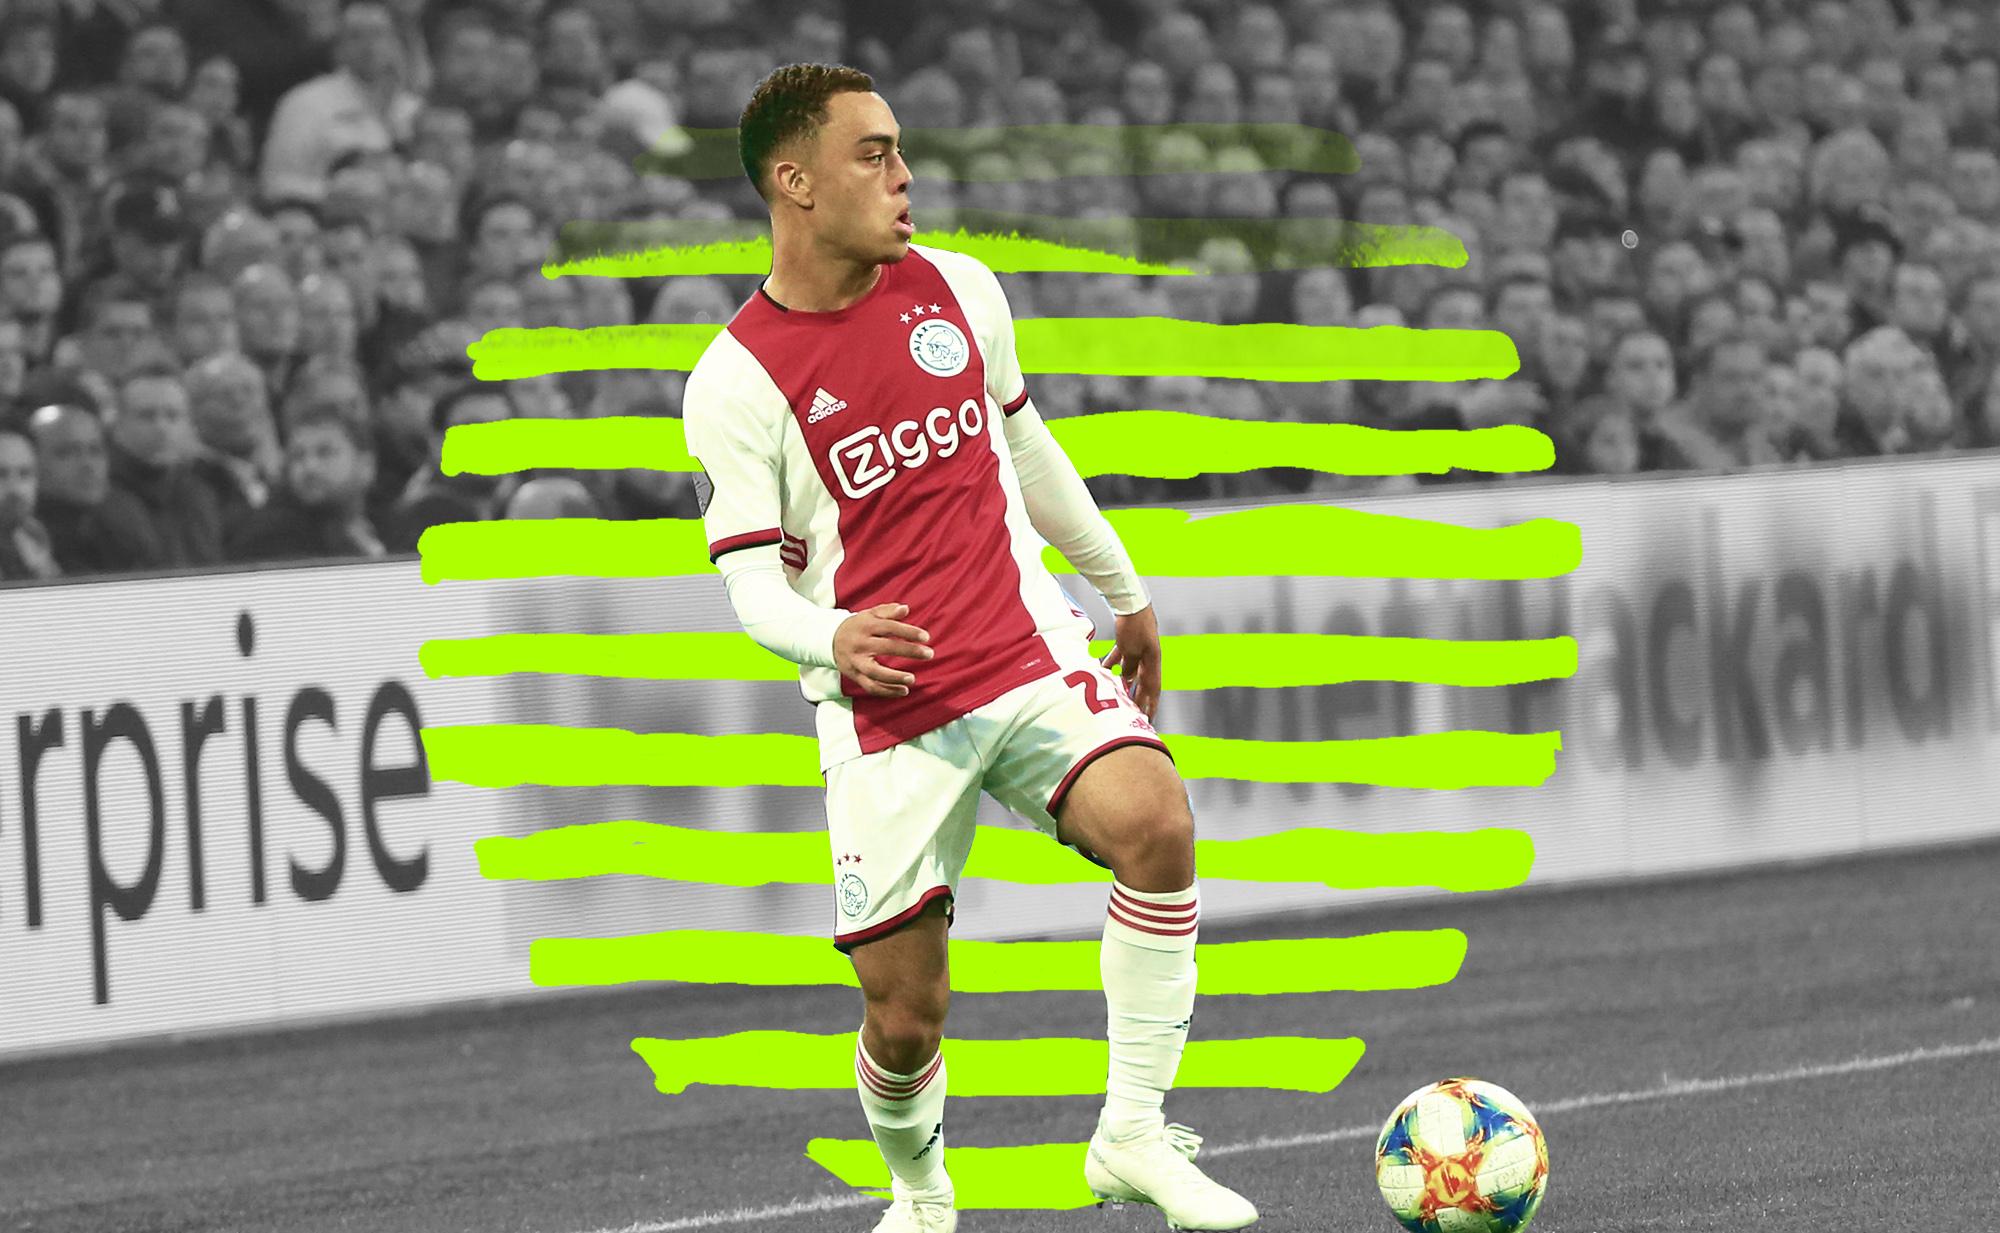 Dest playing for Ajax against Feyenoord